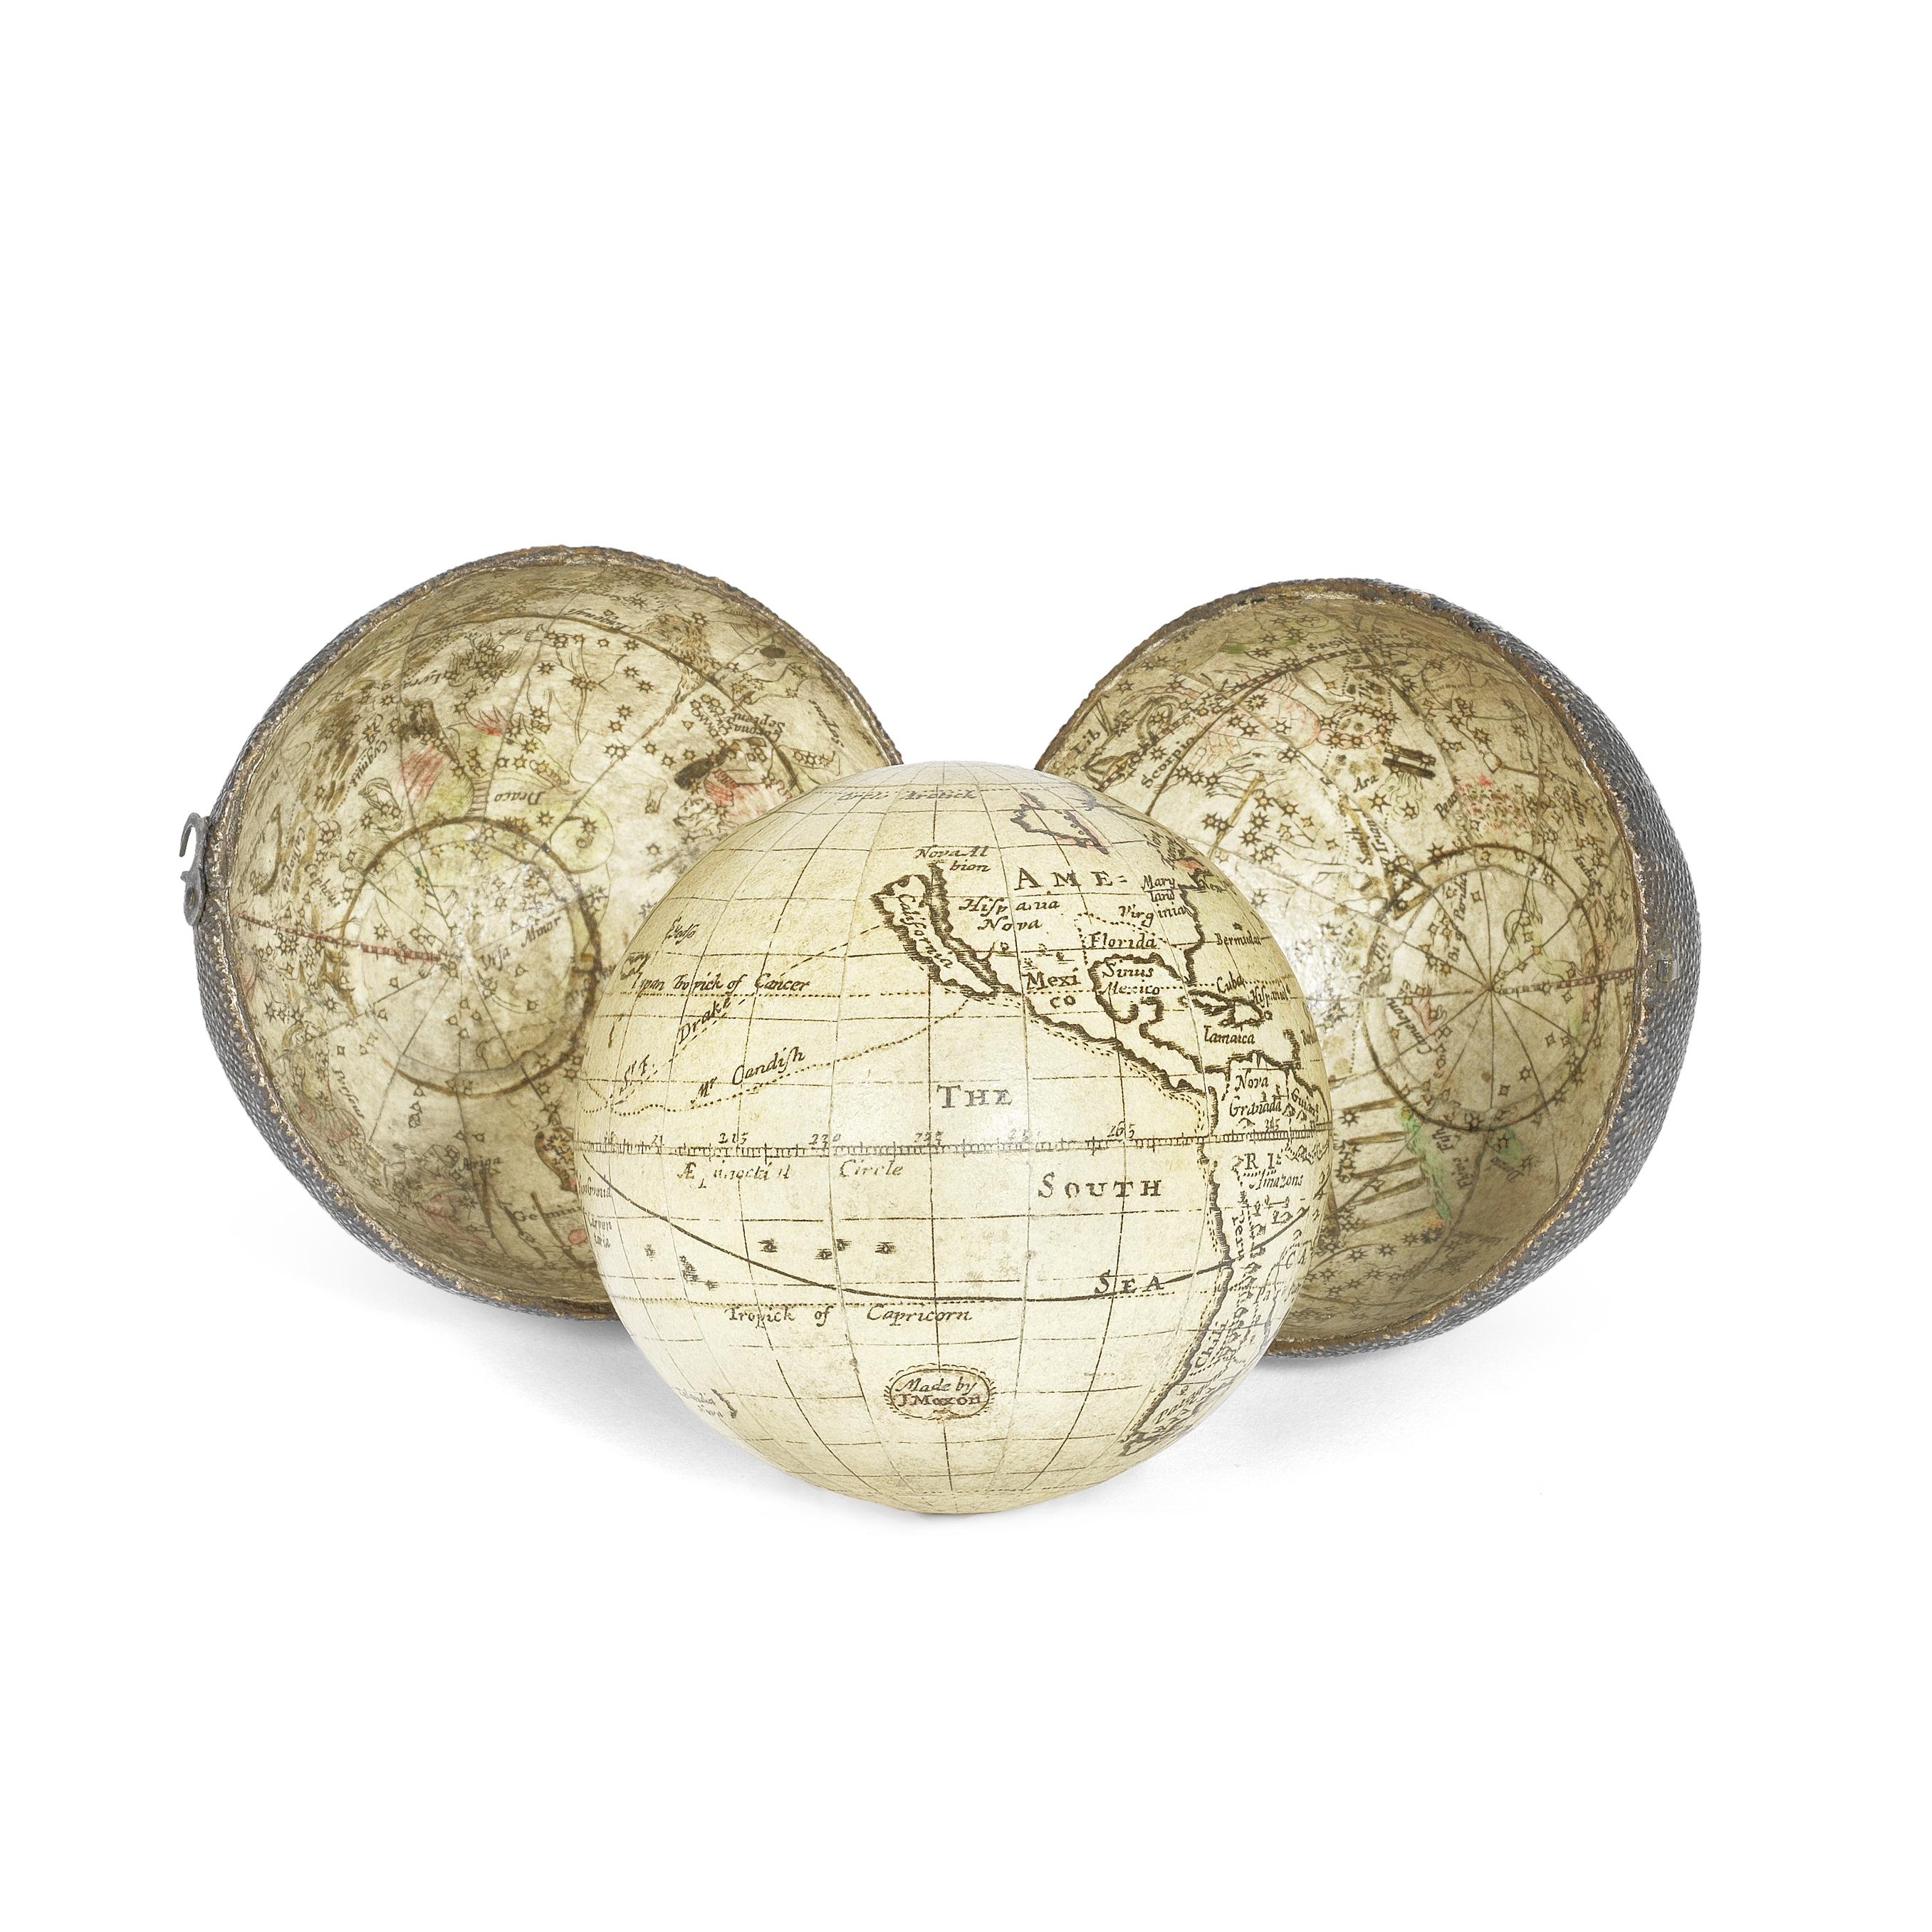 A very rare Joseph Moxon 2 ¾-inch pocket globe, English, circa 1675,